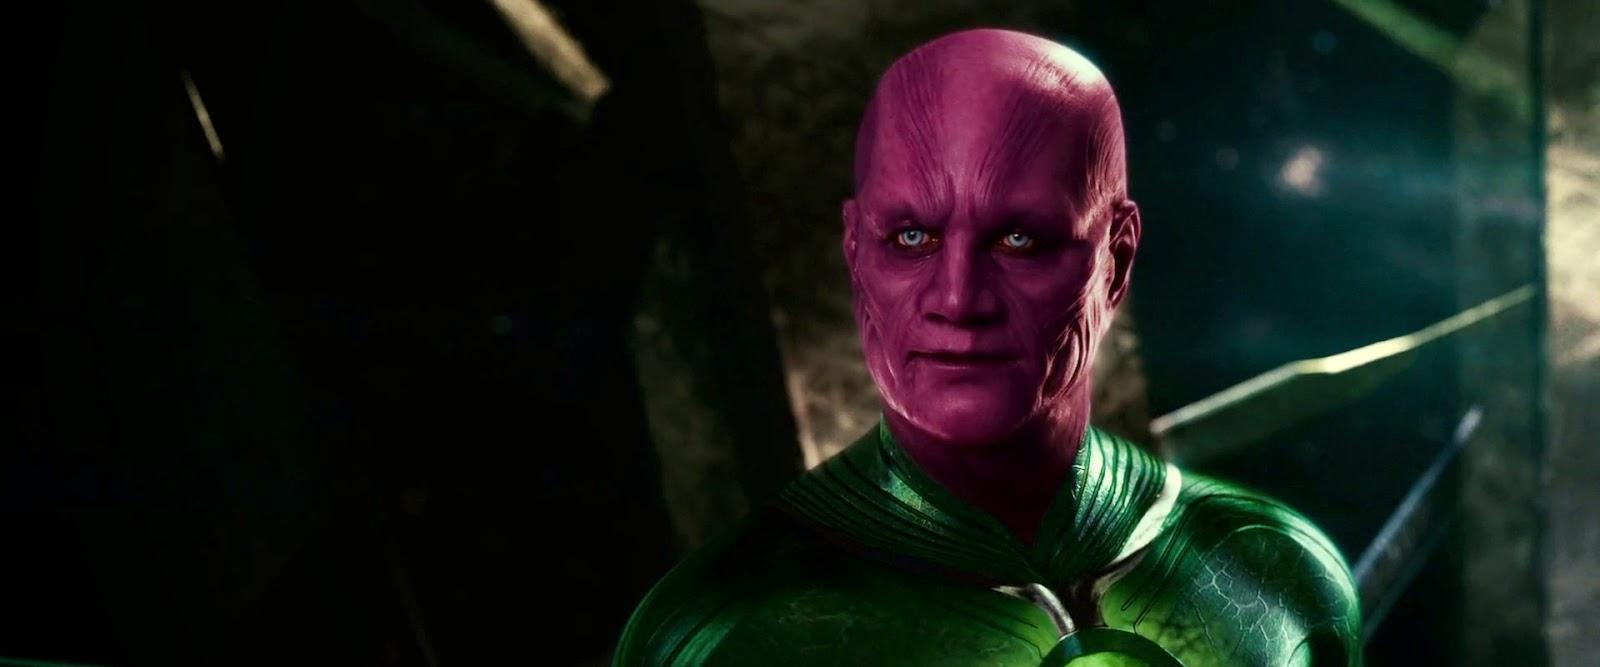 Green Lantern (2011) S4 s Green Lantern (2011)